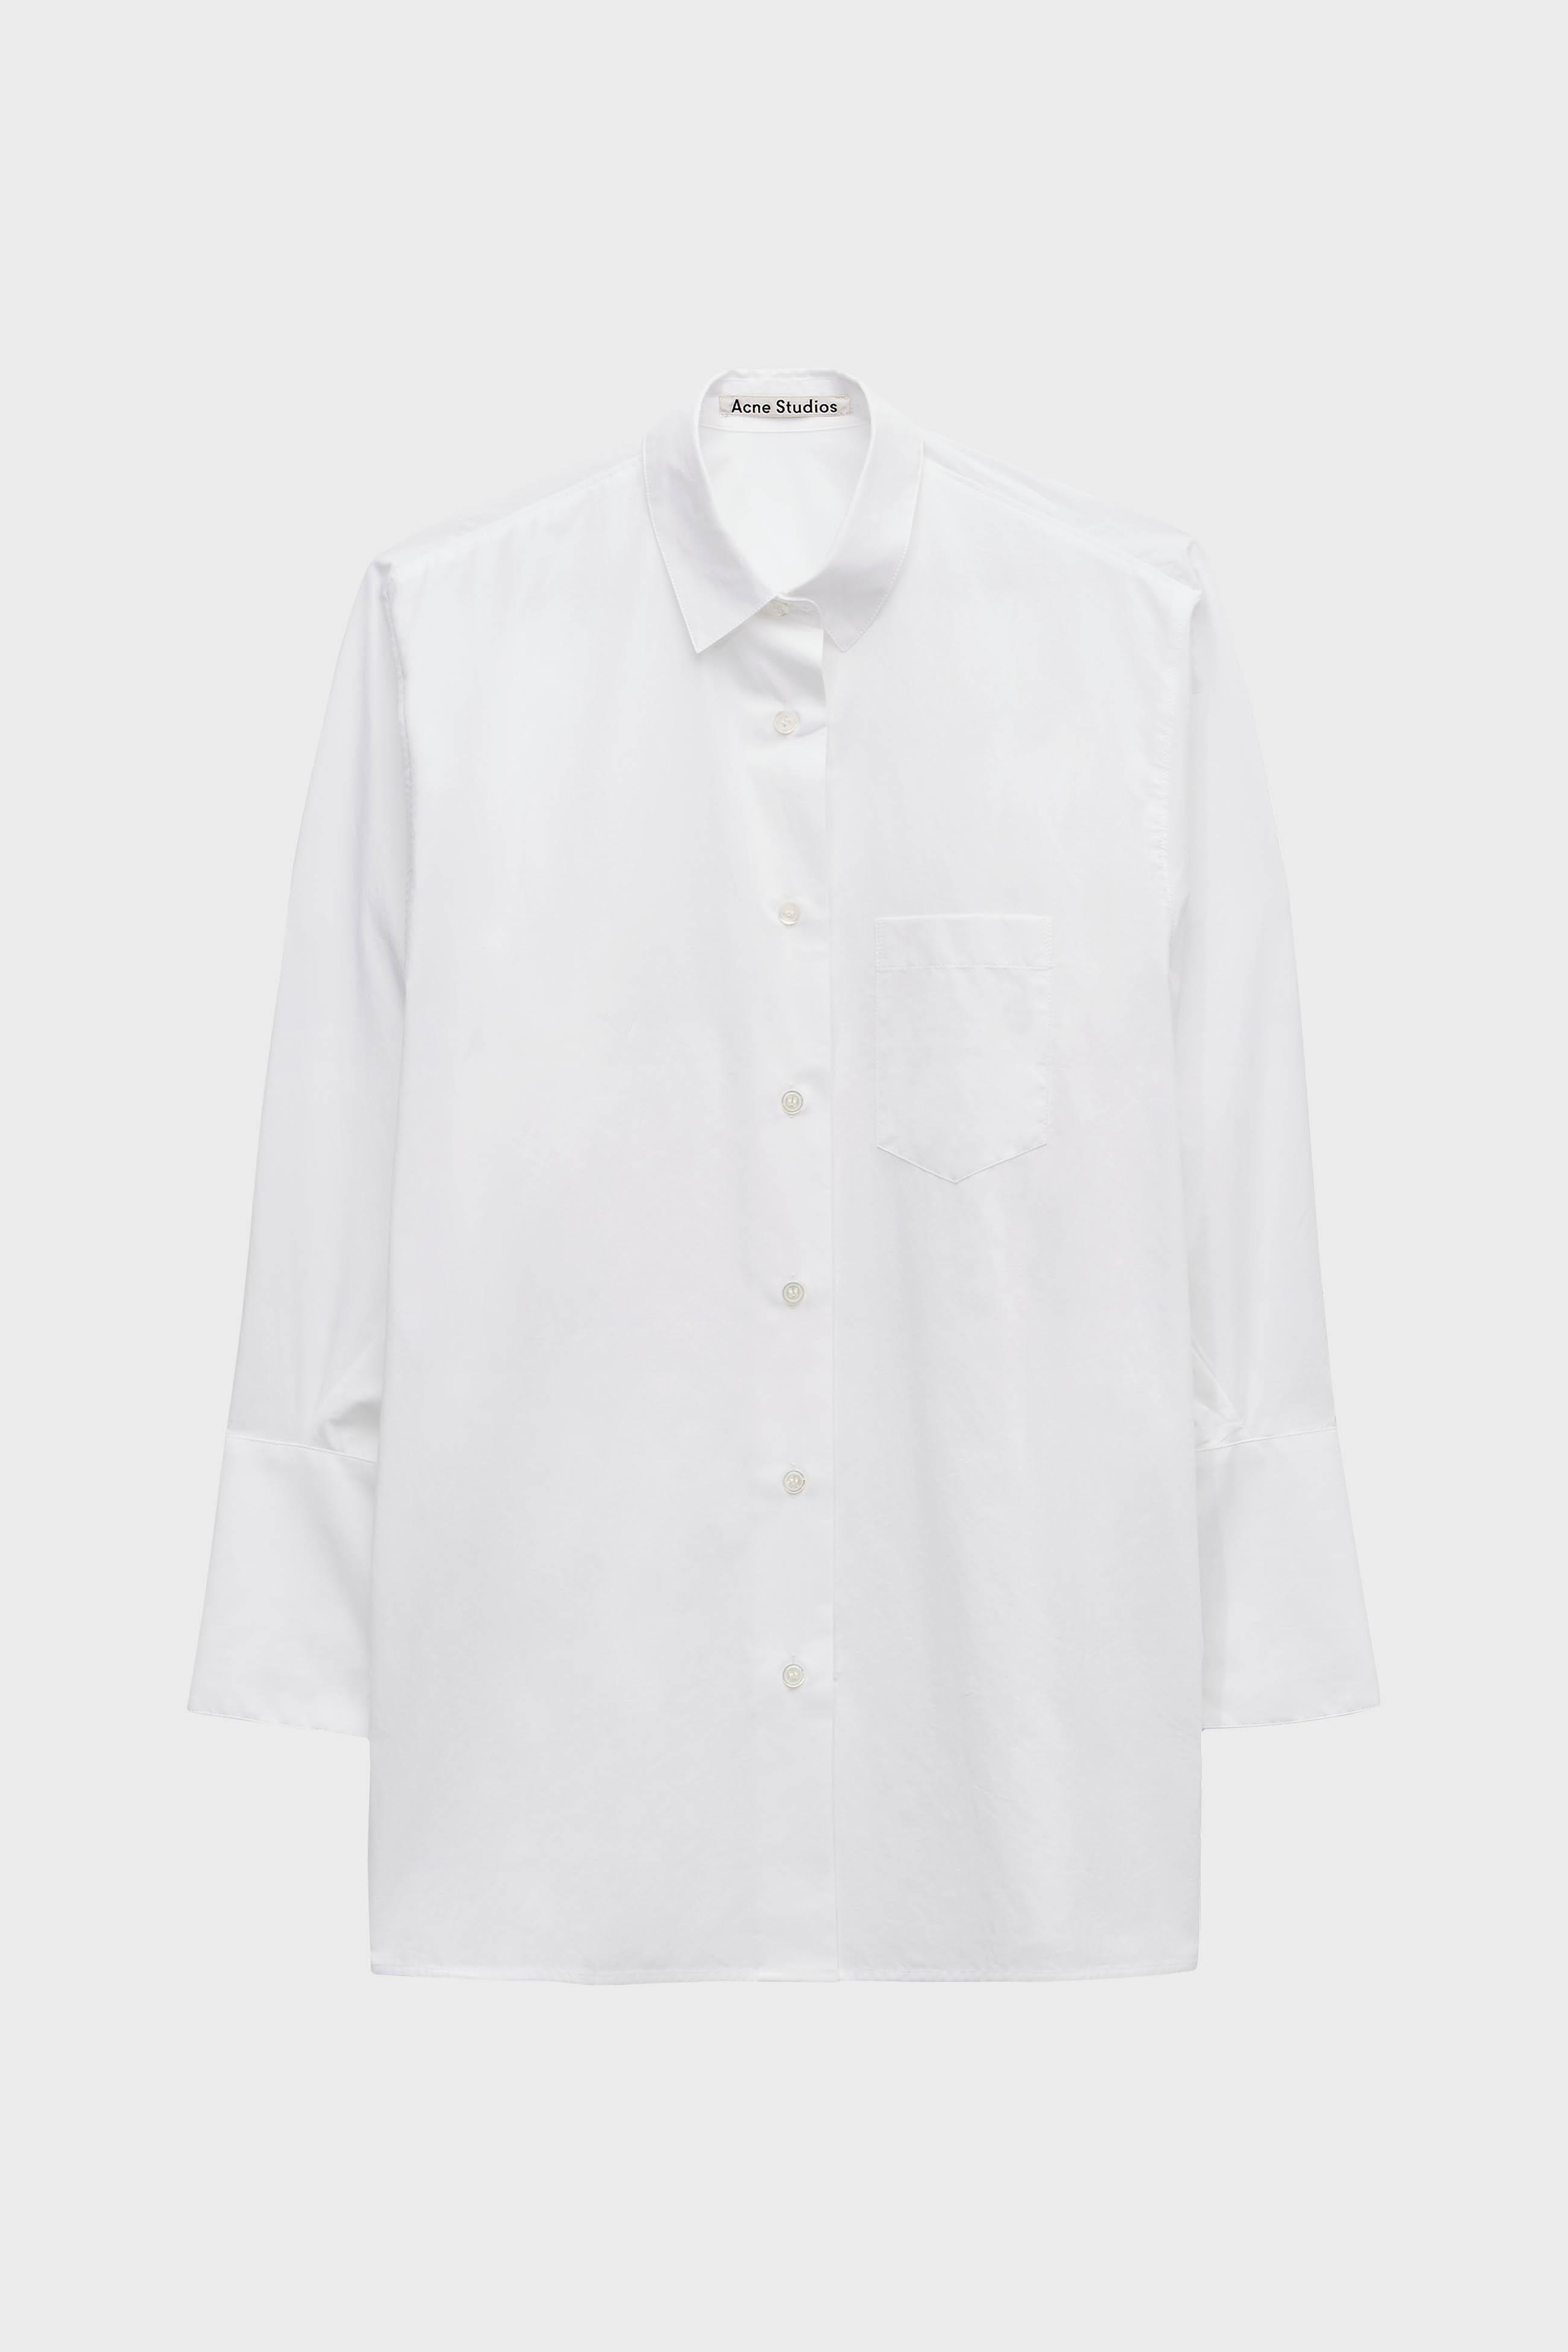 7356ade4eed Lyst - Acne Studios Bai Cotton Poplin Shirt in White